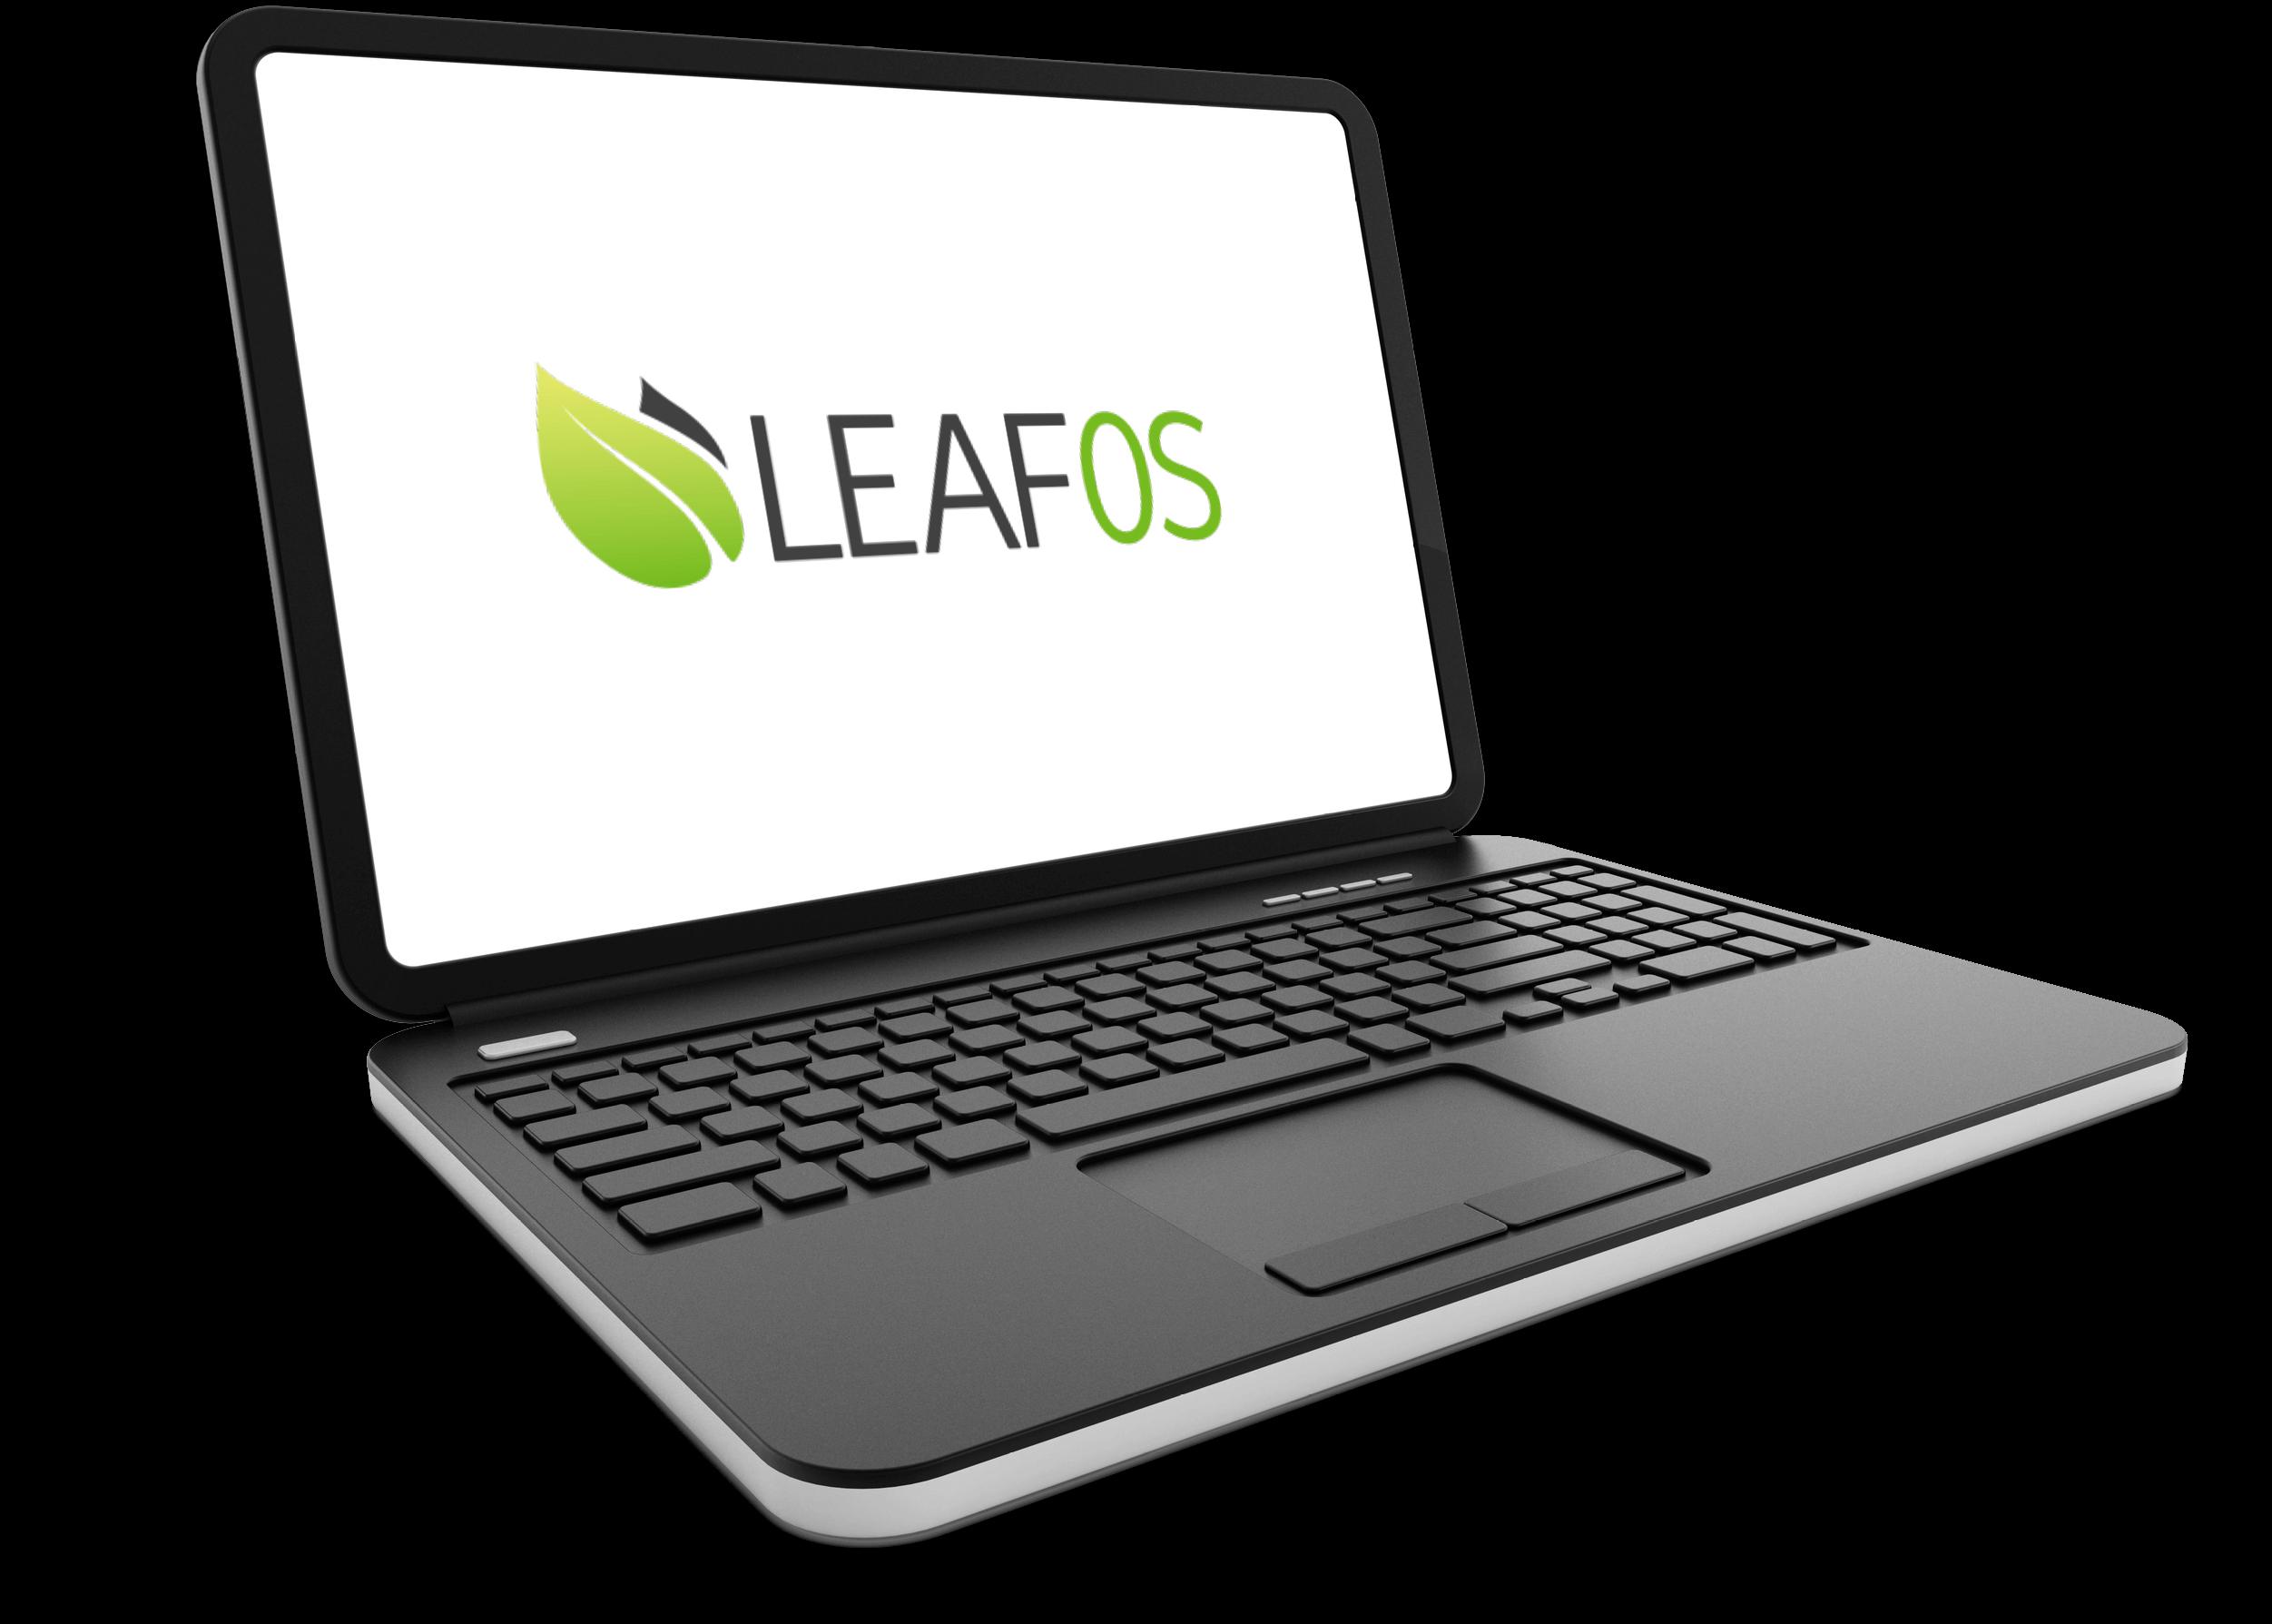 LEAF OS利旧神器可以将旧笔记本、PC升级为高性能的云电脑